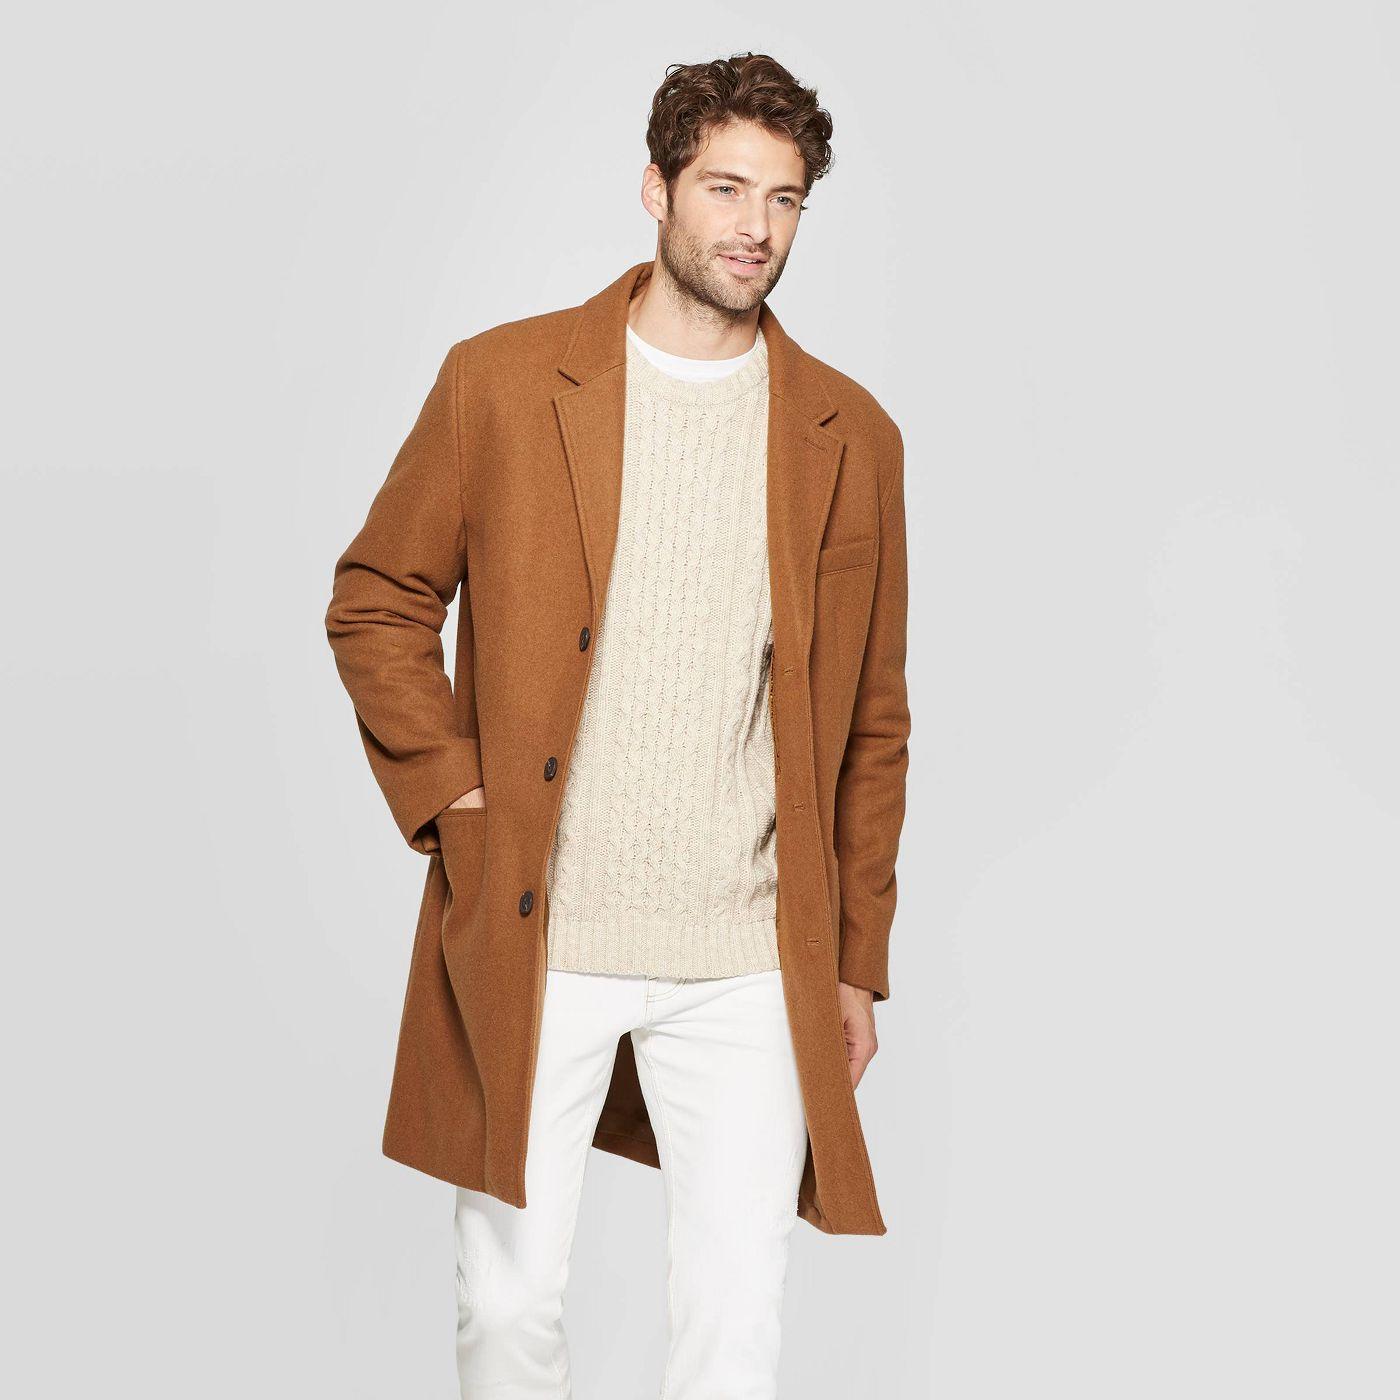 Goodfellow & Co Mens Wool Blend Overcoat